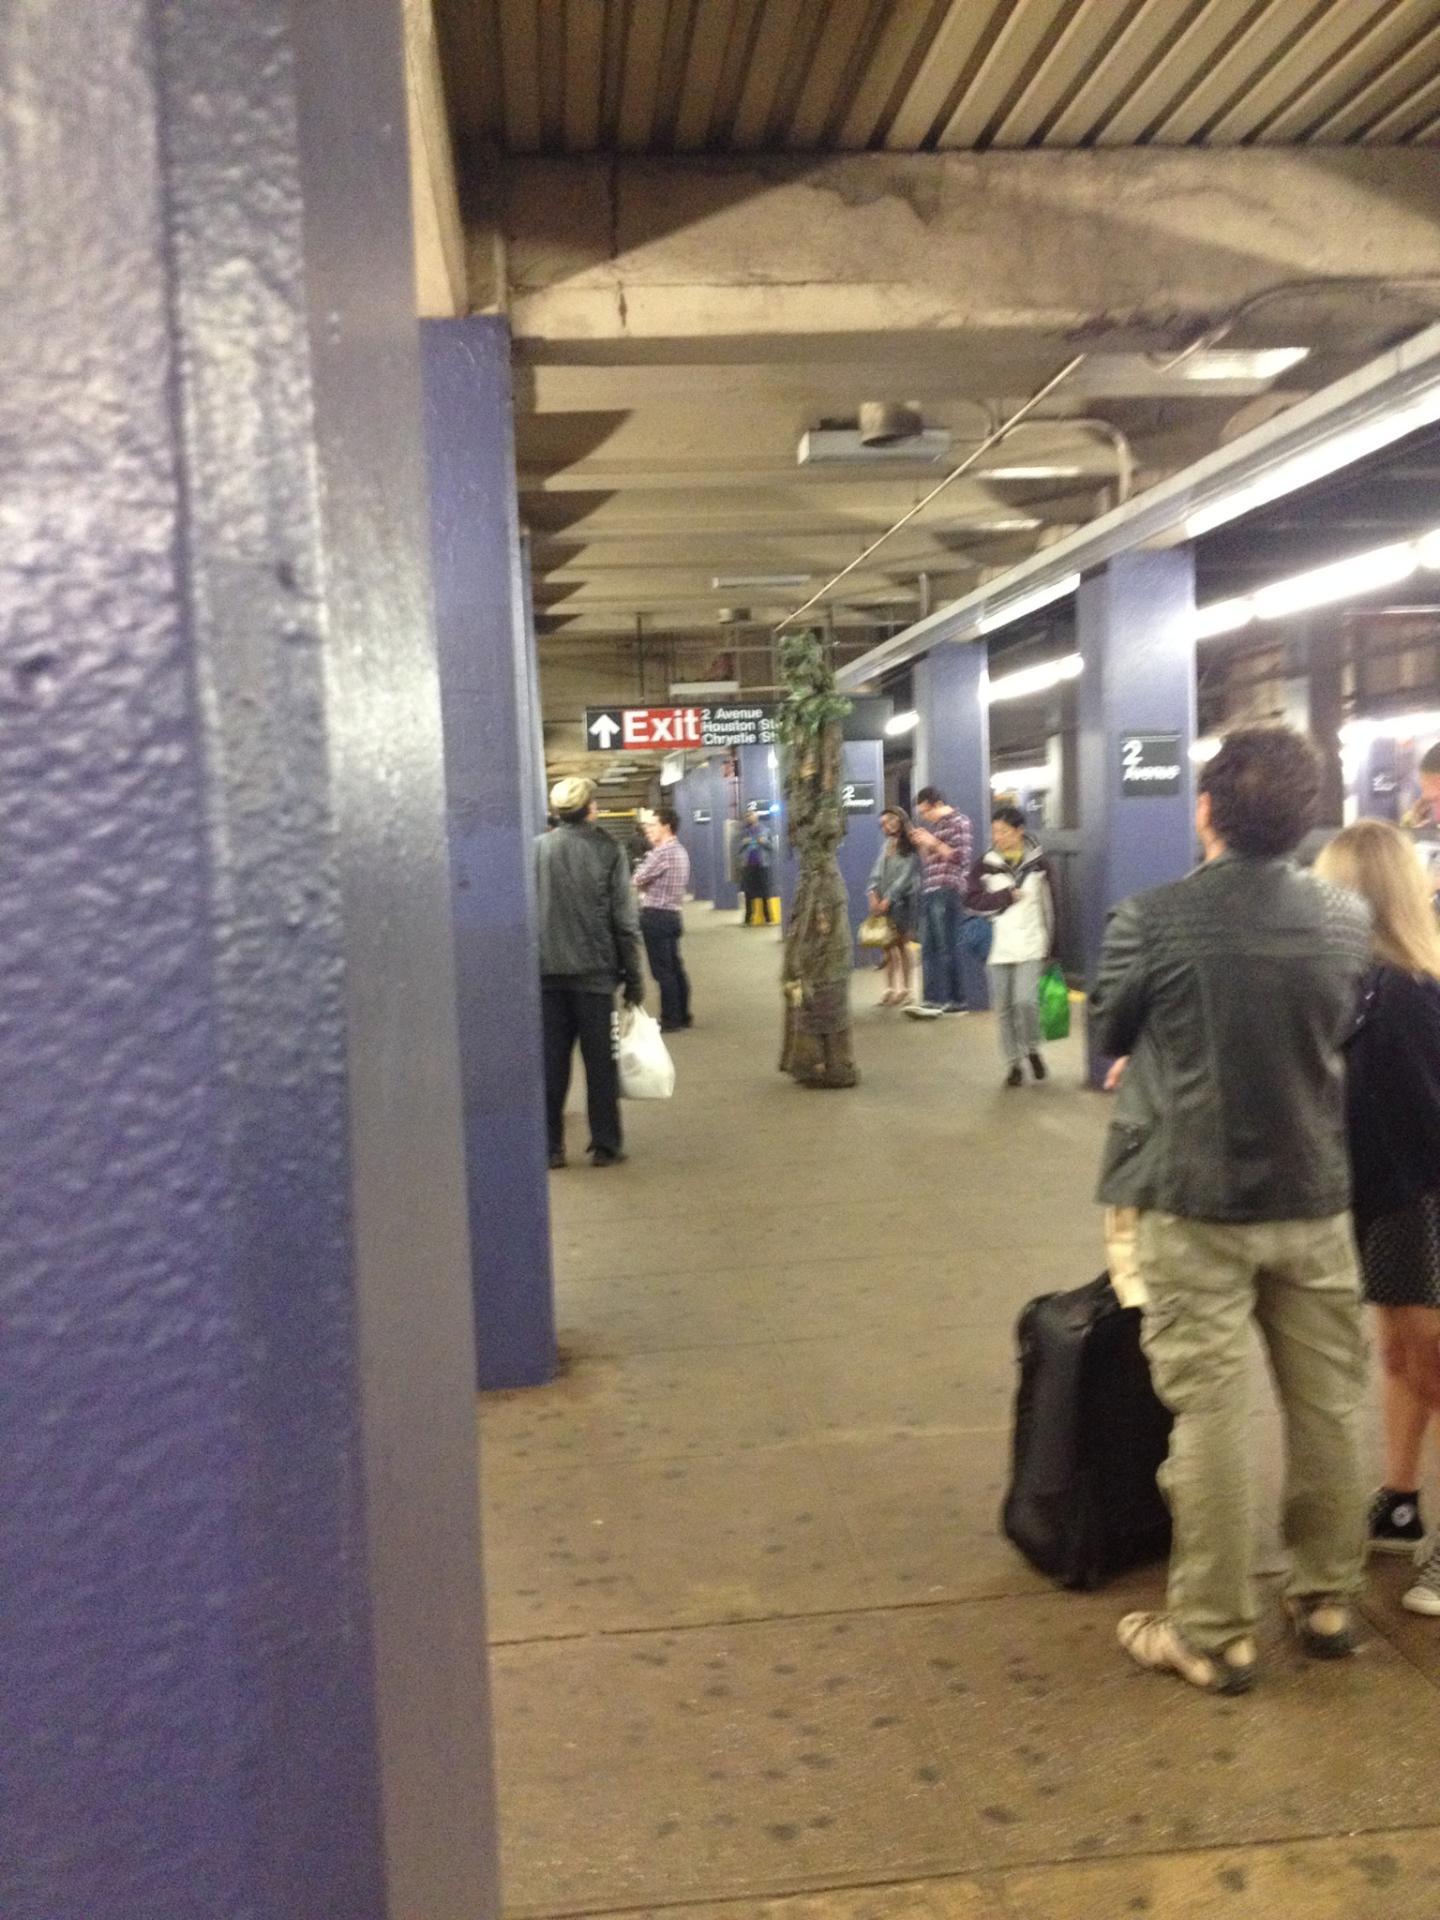 Ent on New York Subway